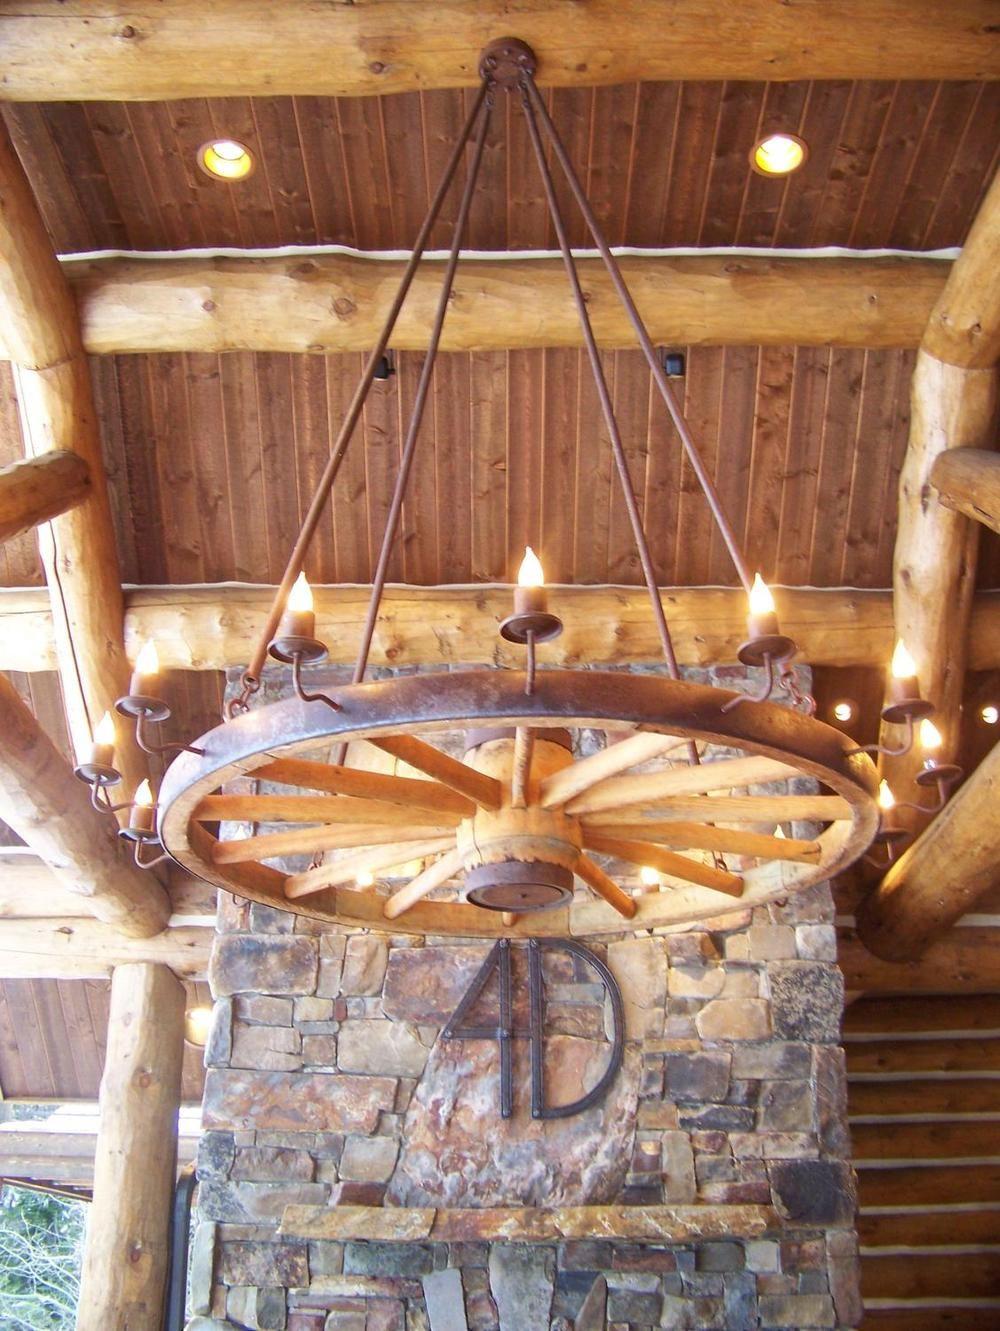 Wood lodge chandelier. Wood lodge chandelier Wagon Wheel ... - Wood Lodge Chandelier For The Home Wagon Wheel Chandelier, Wagon